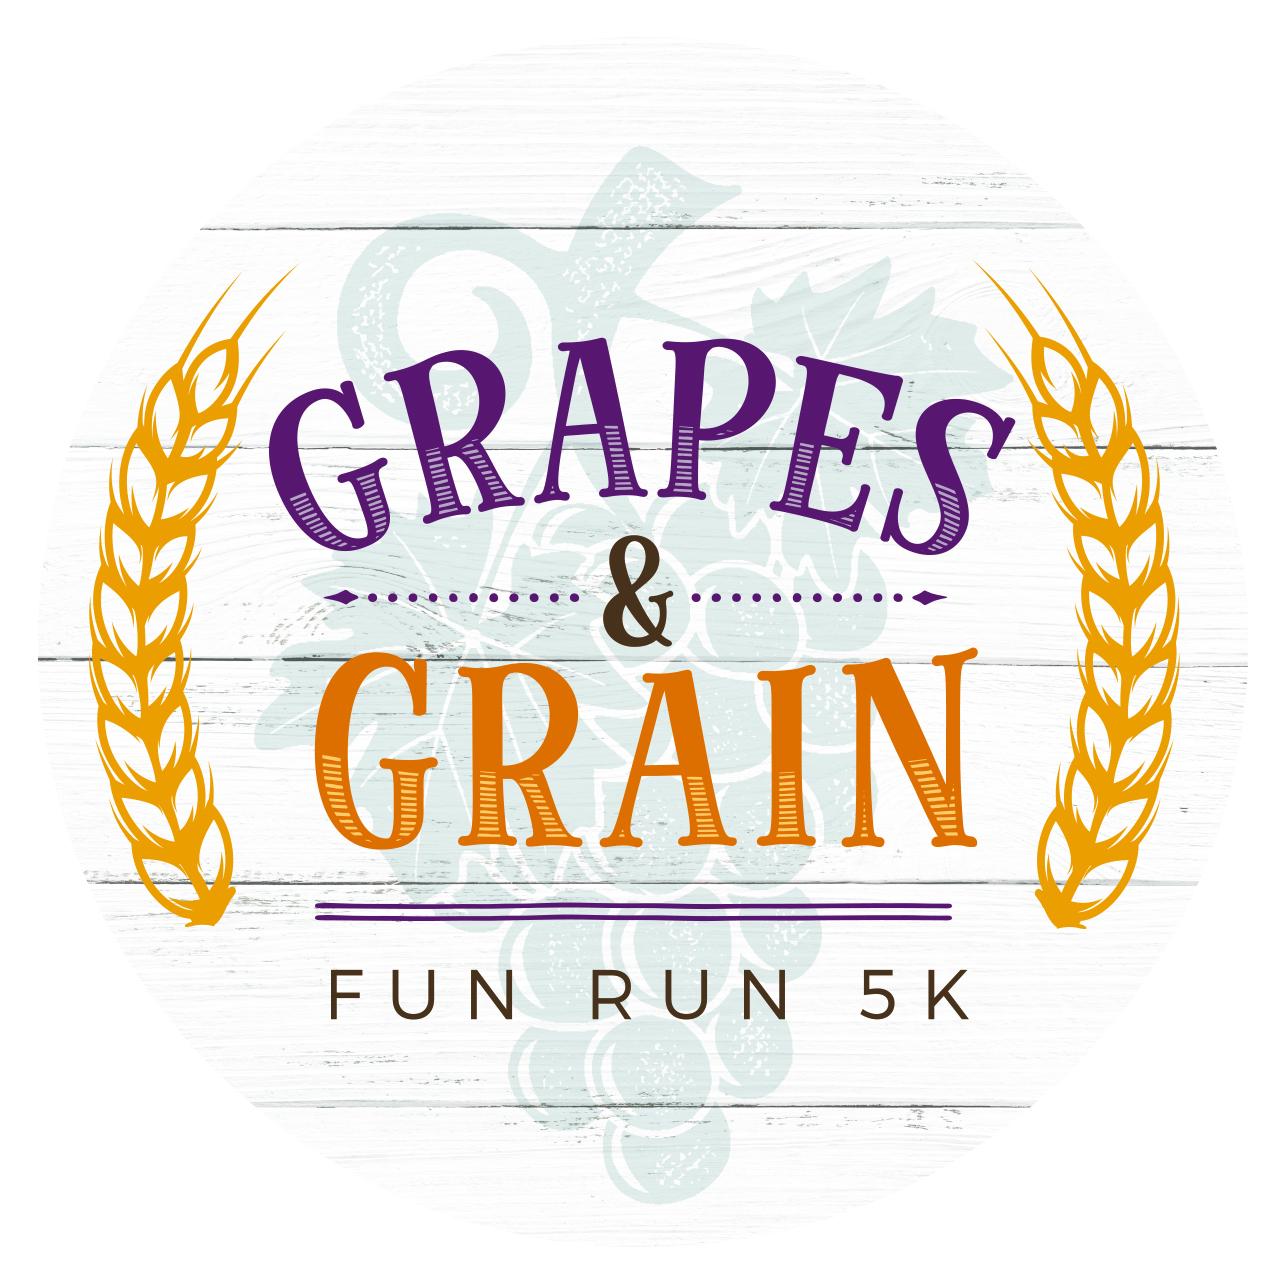 Grapes & Grain Fun Run 5k logo